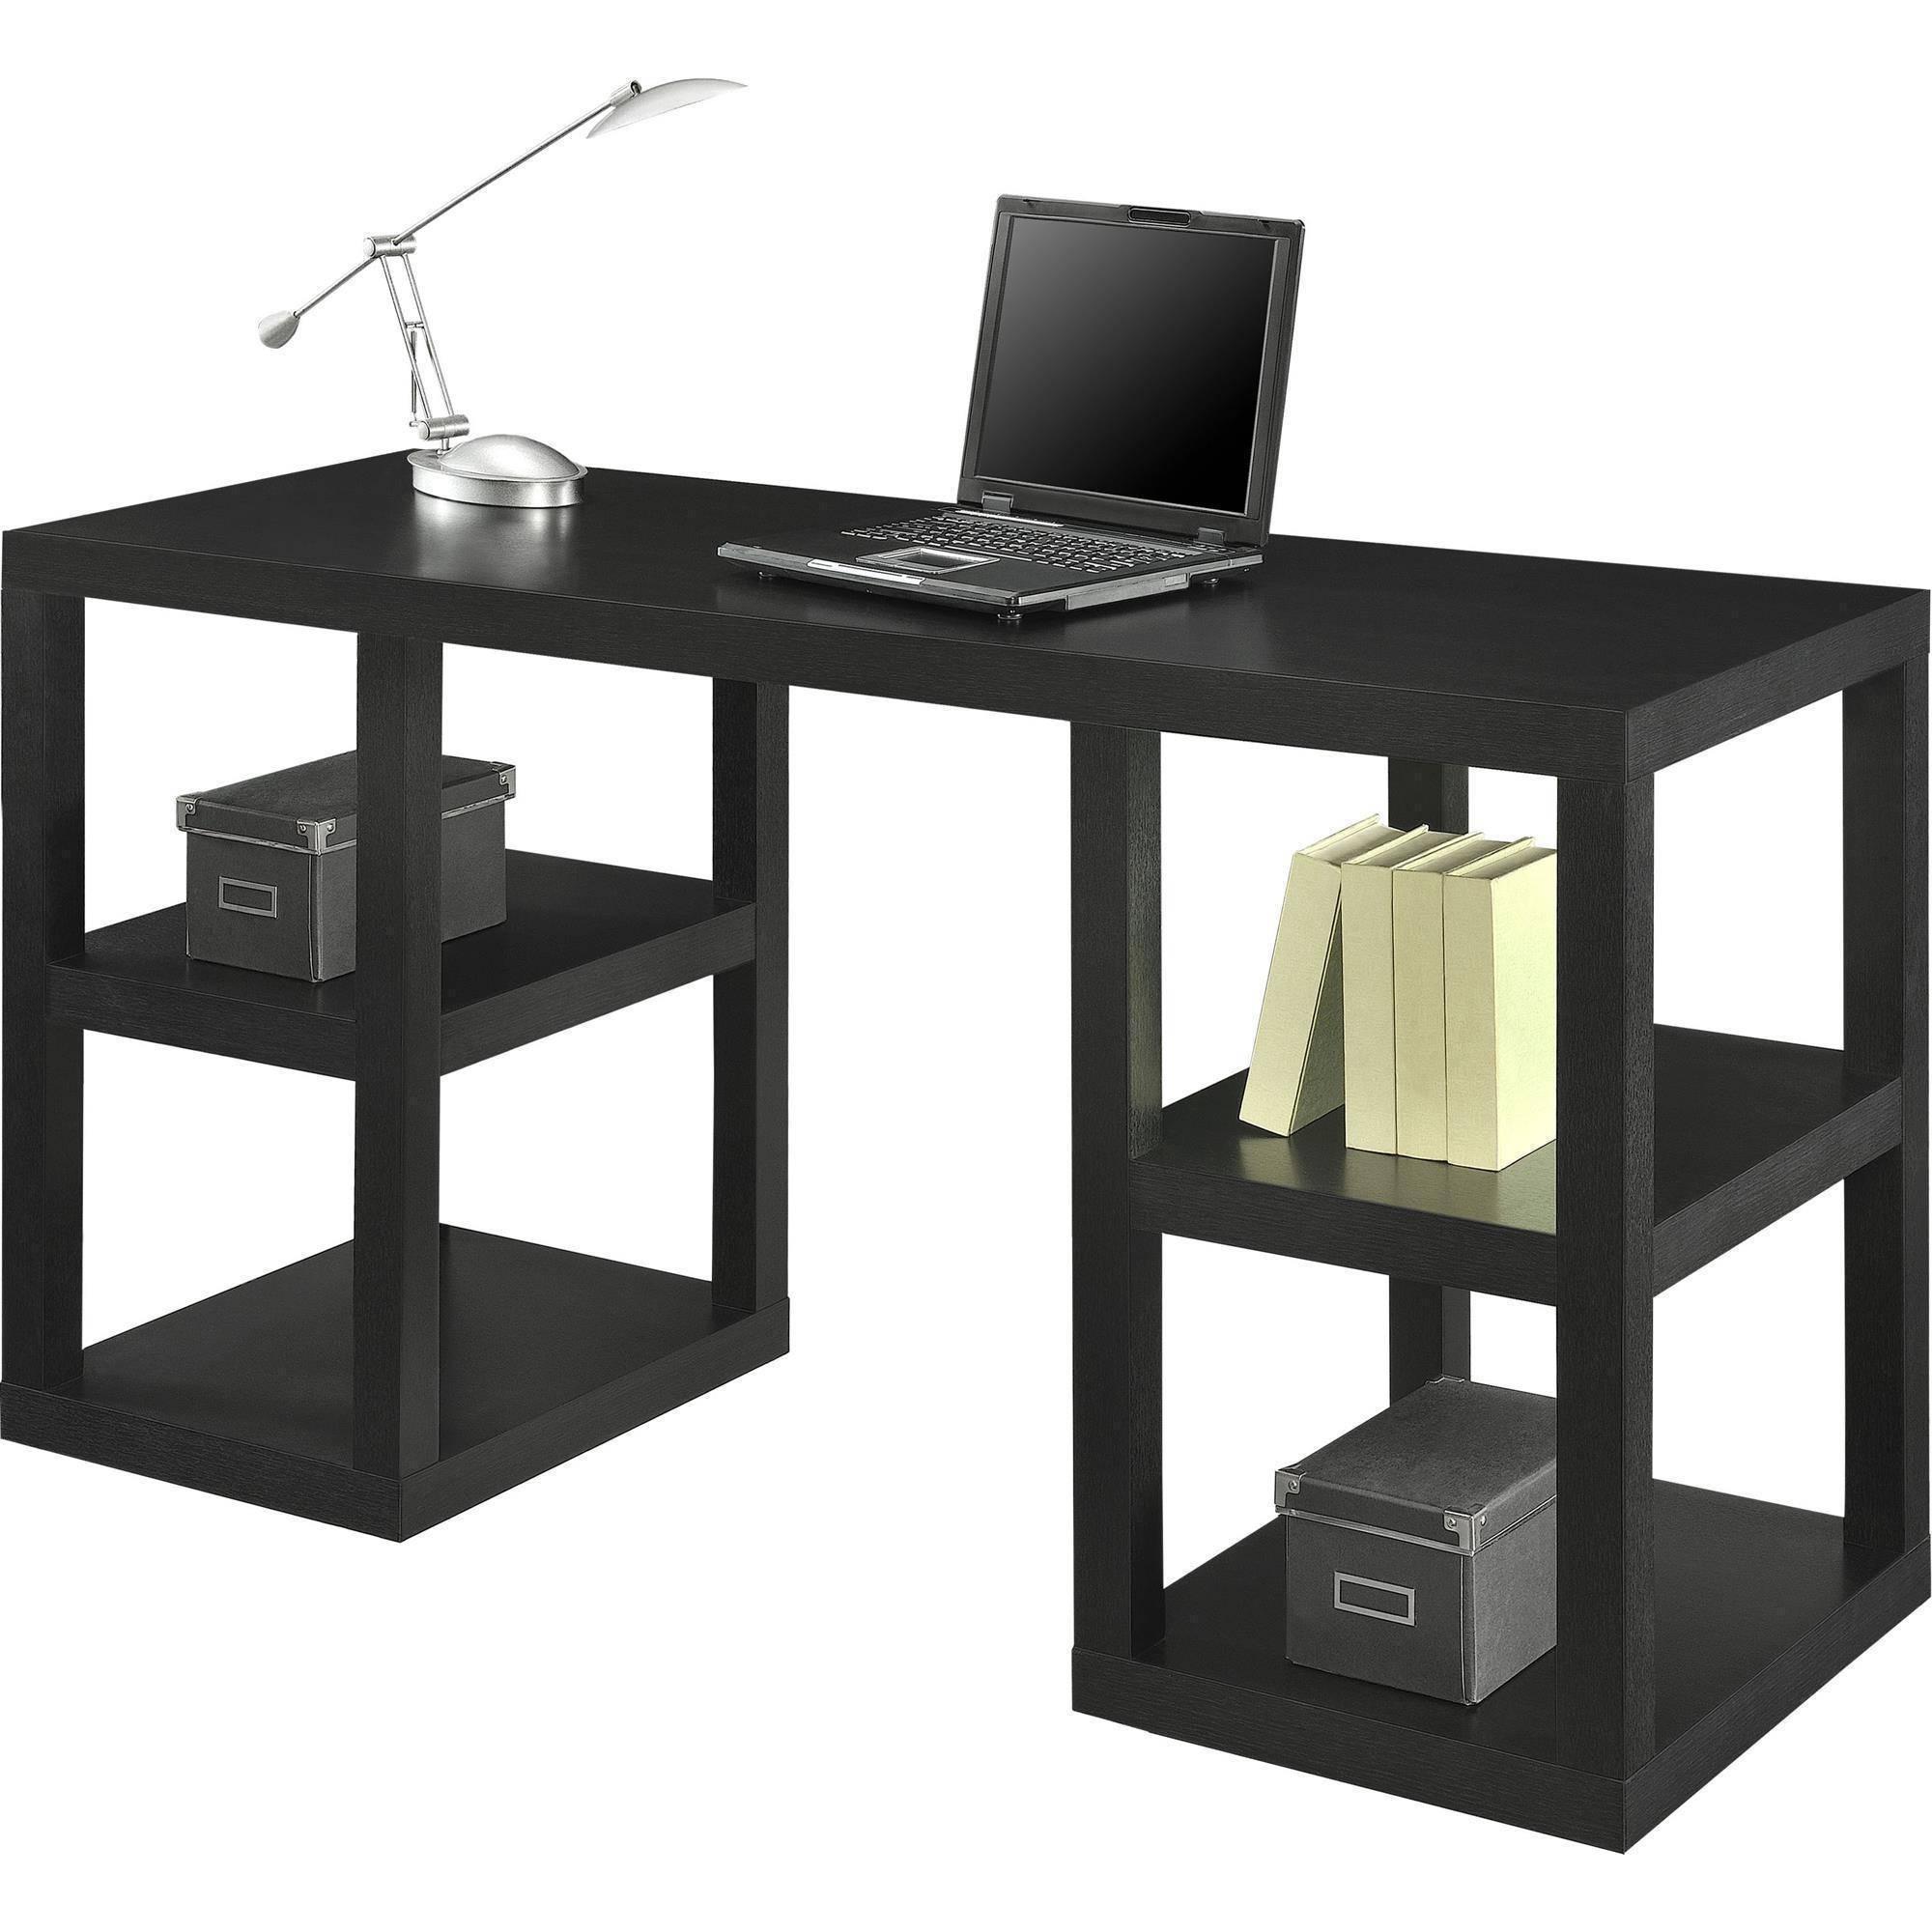 Most Recent Mainstays Double Pedestal Parsons Desk, Multiple Colors – Walmart For Computer Desks At Walmart (View 10 of 20)